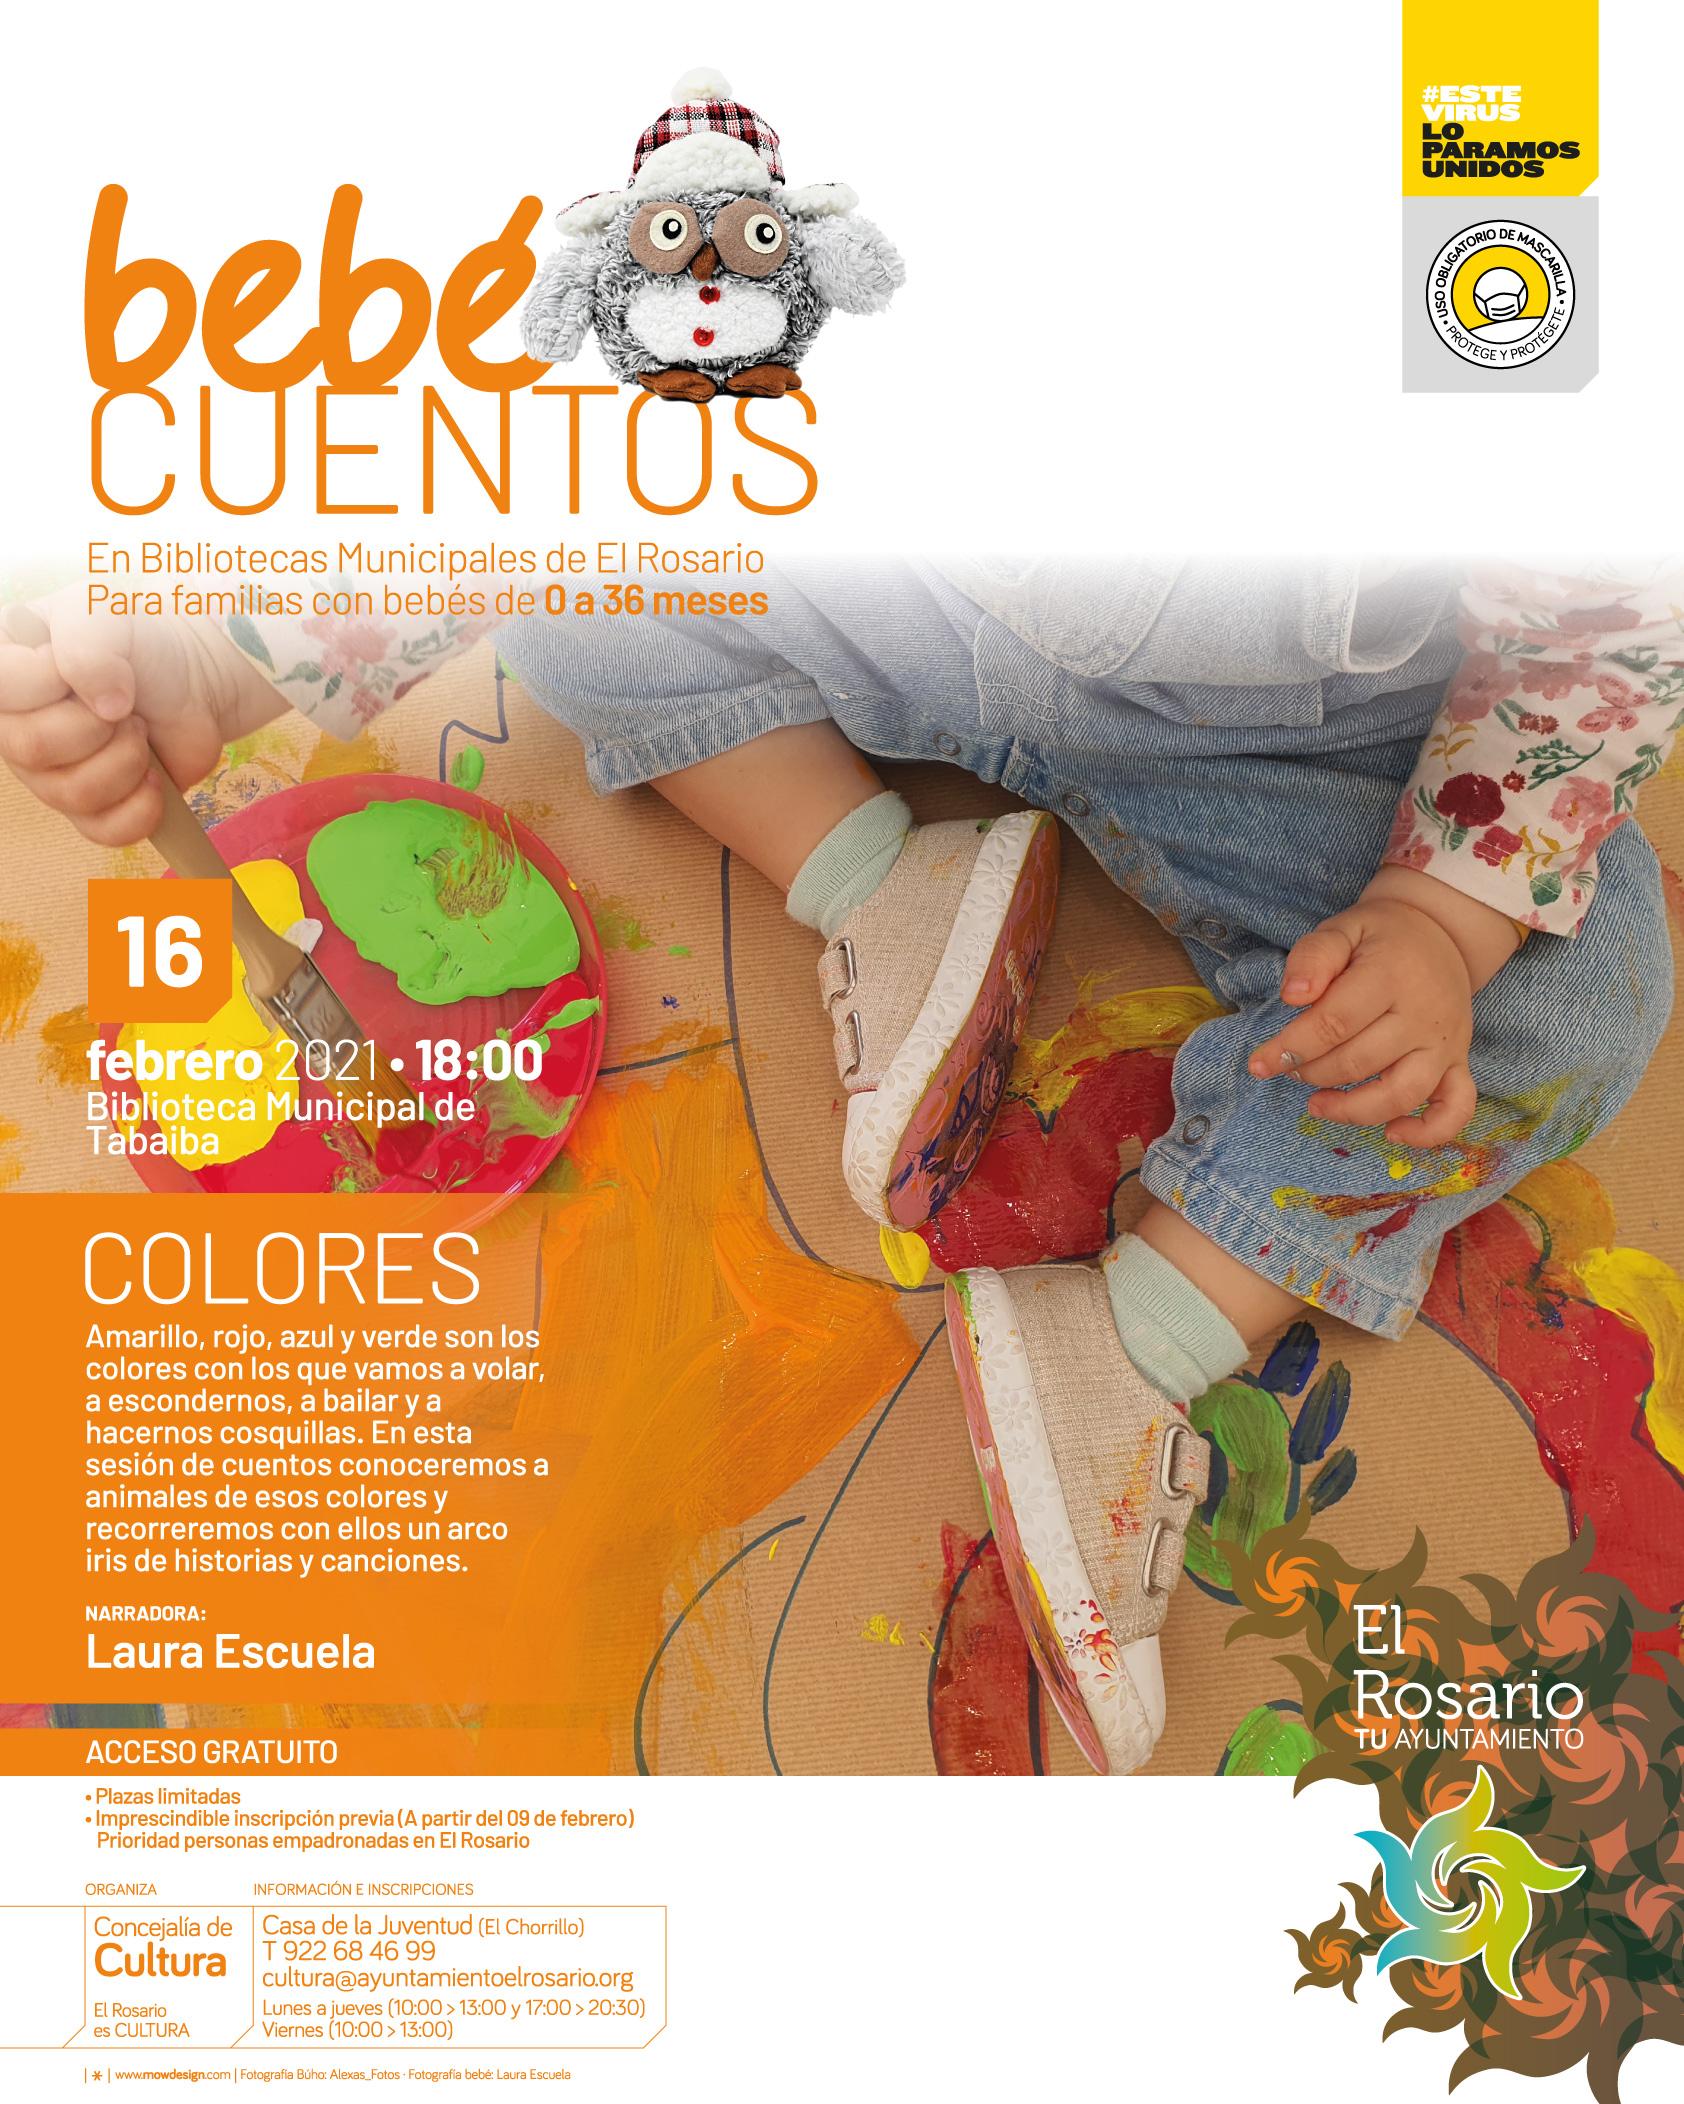 BEBECUENTOS-20210216-CARTEL_A3-20210208-01af-redes